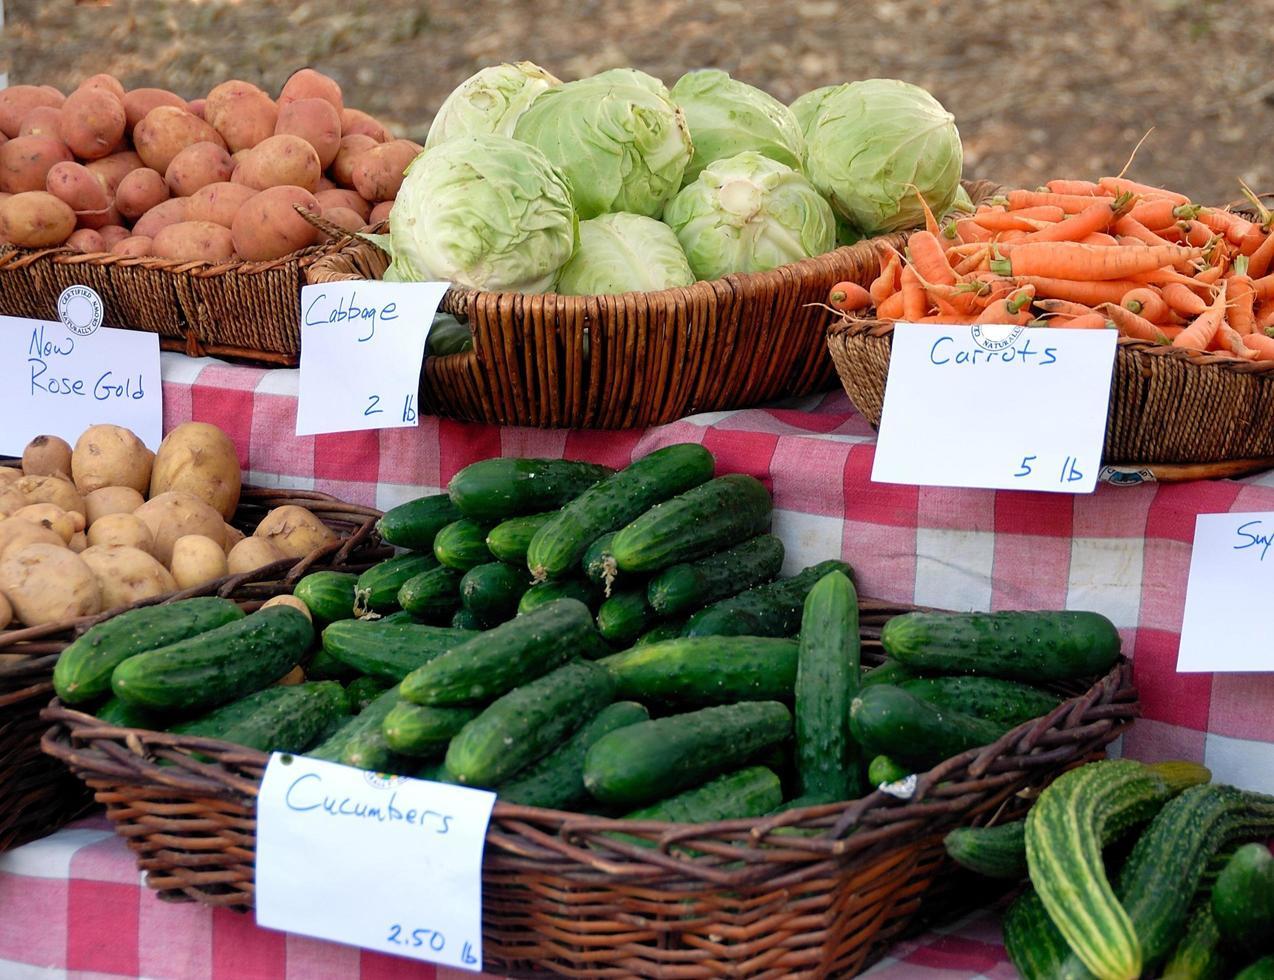 verduras para la venta foto